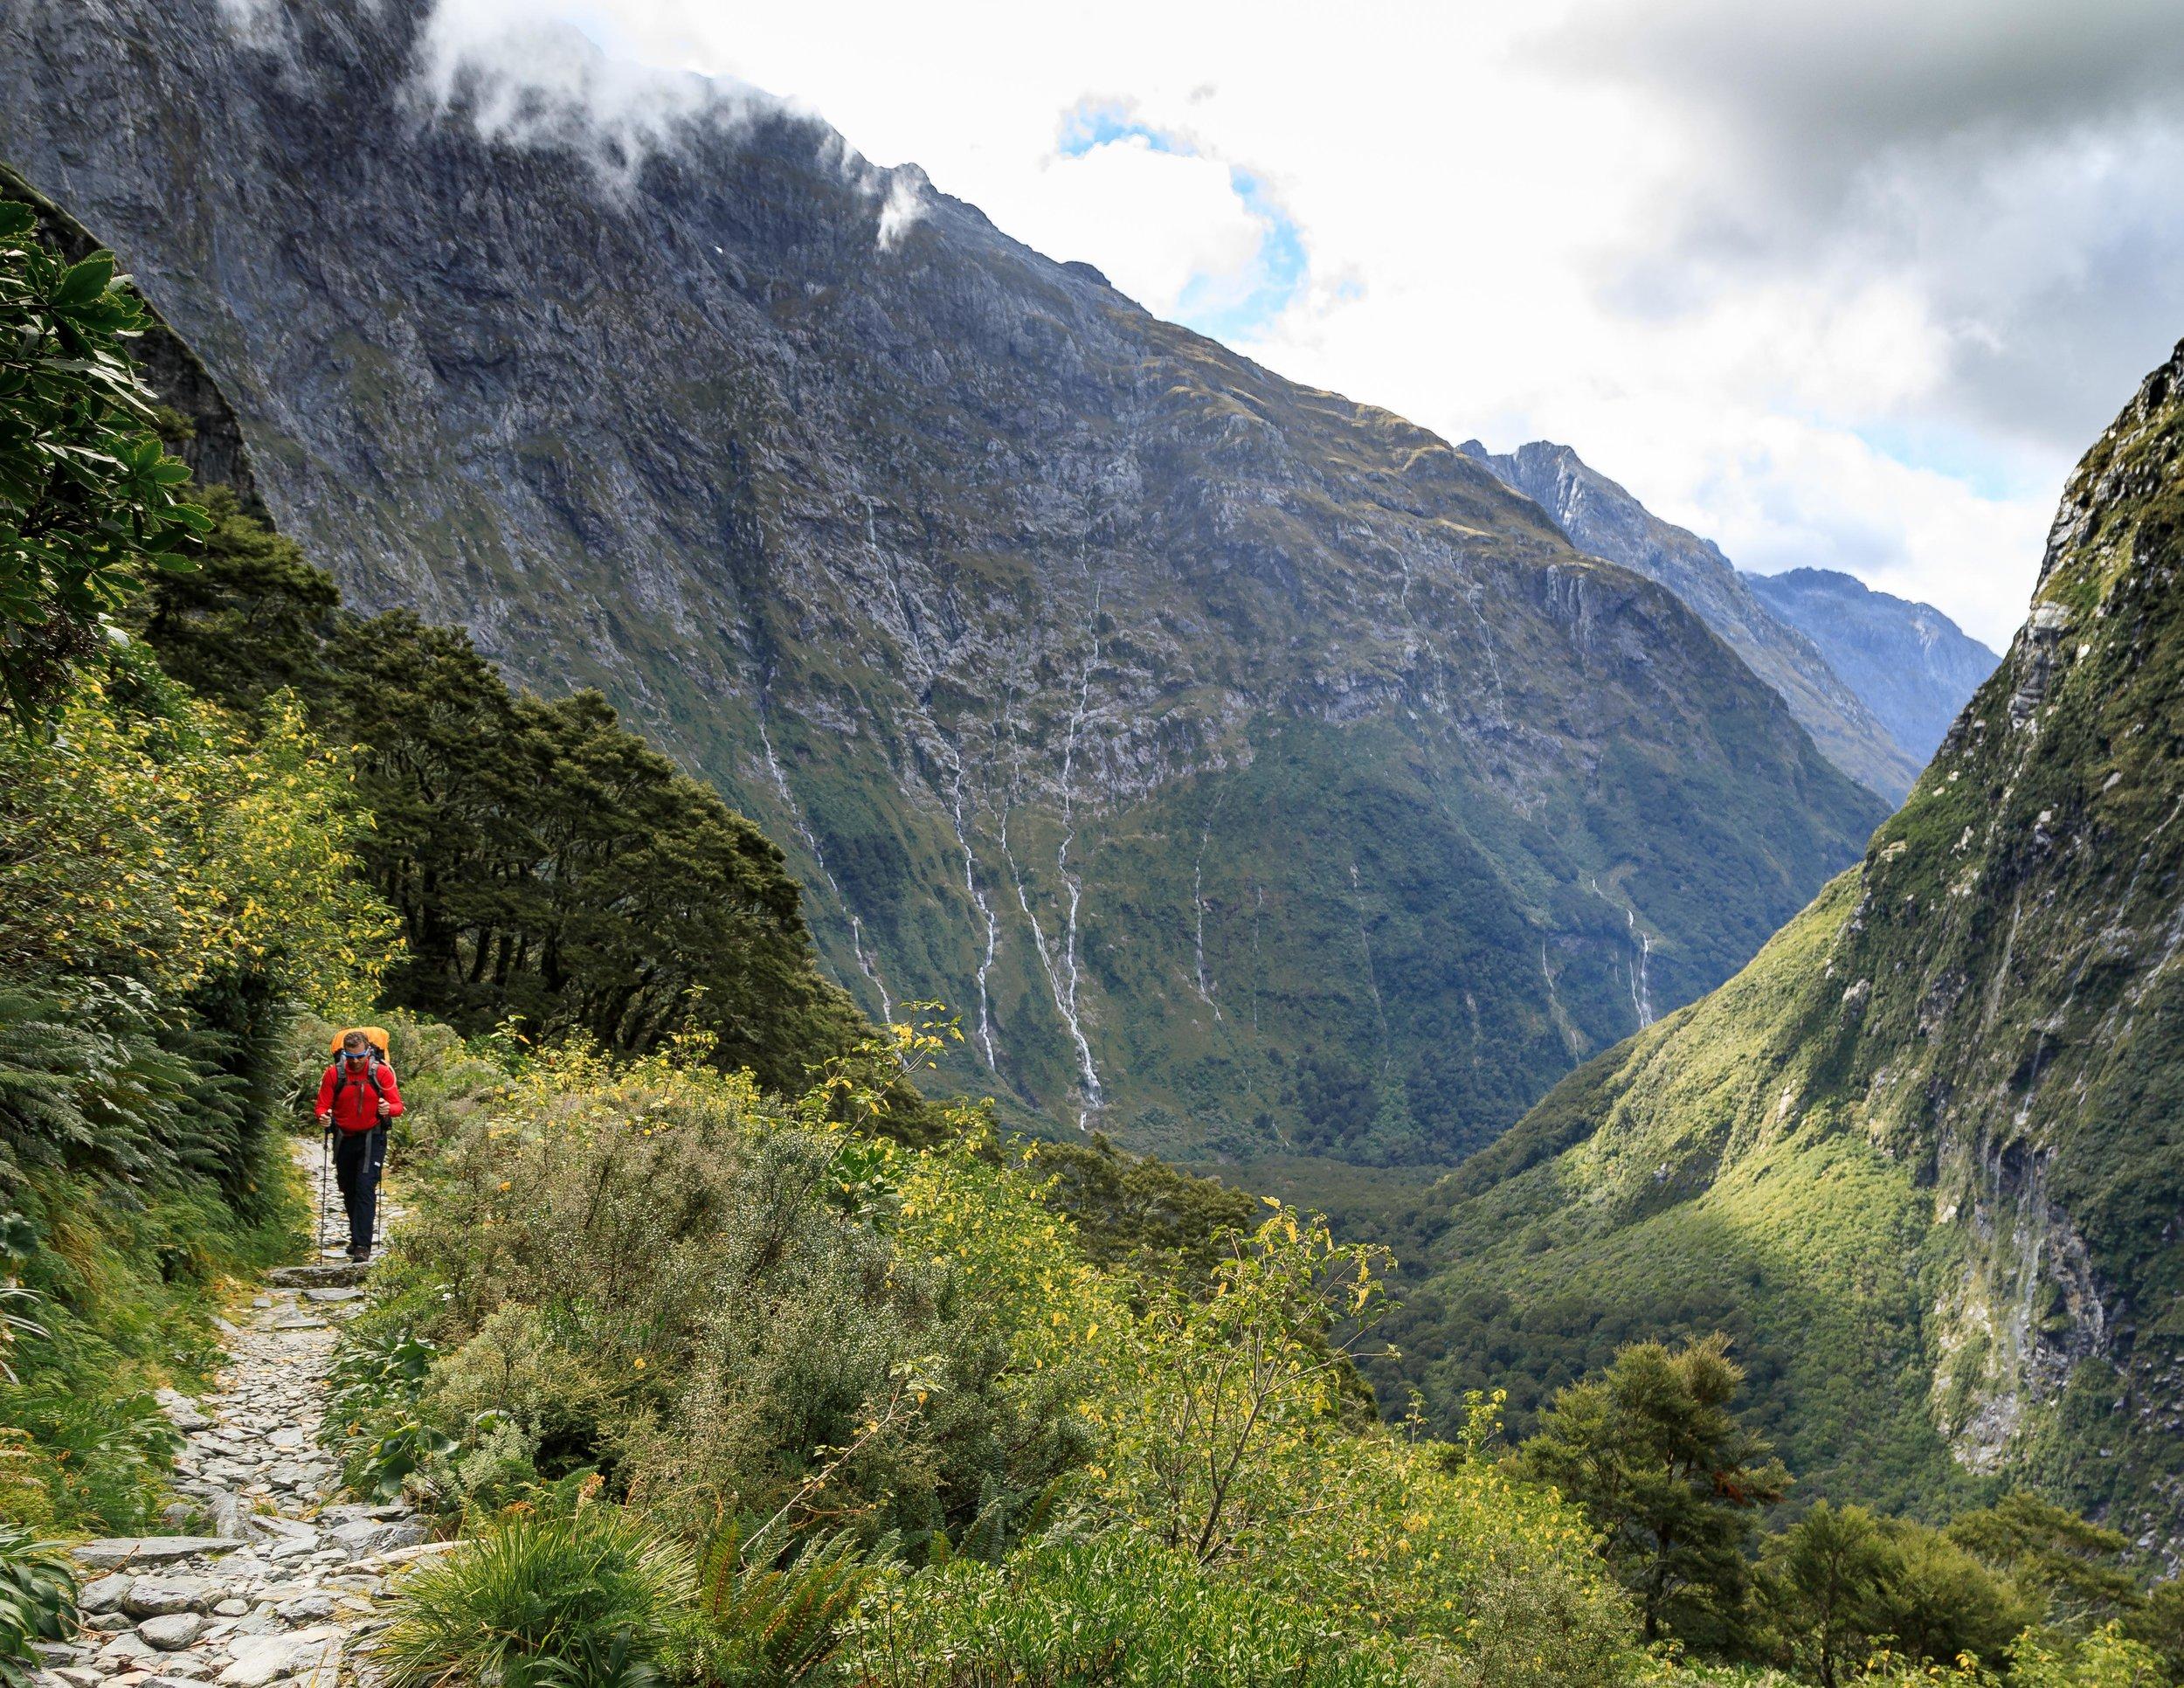 The climb to the MacKinnon Pass